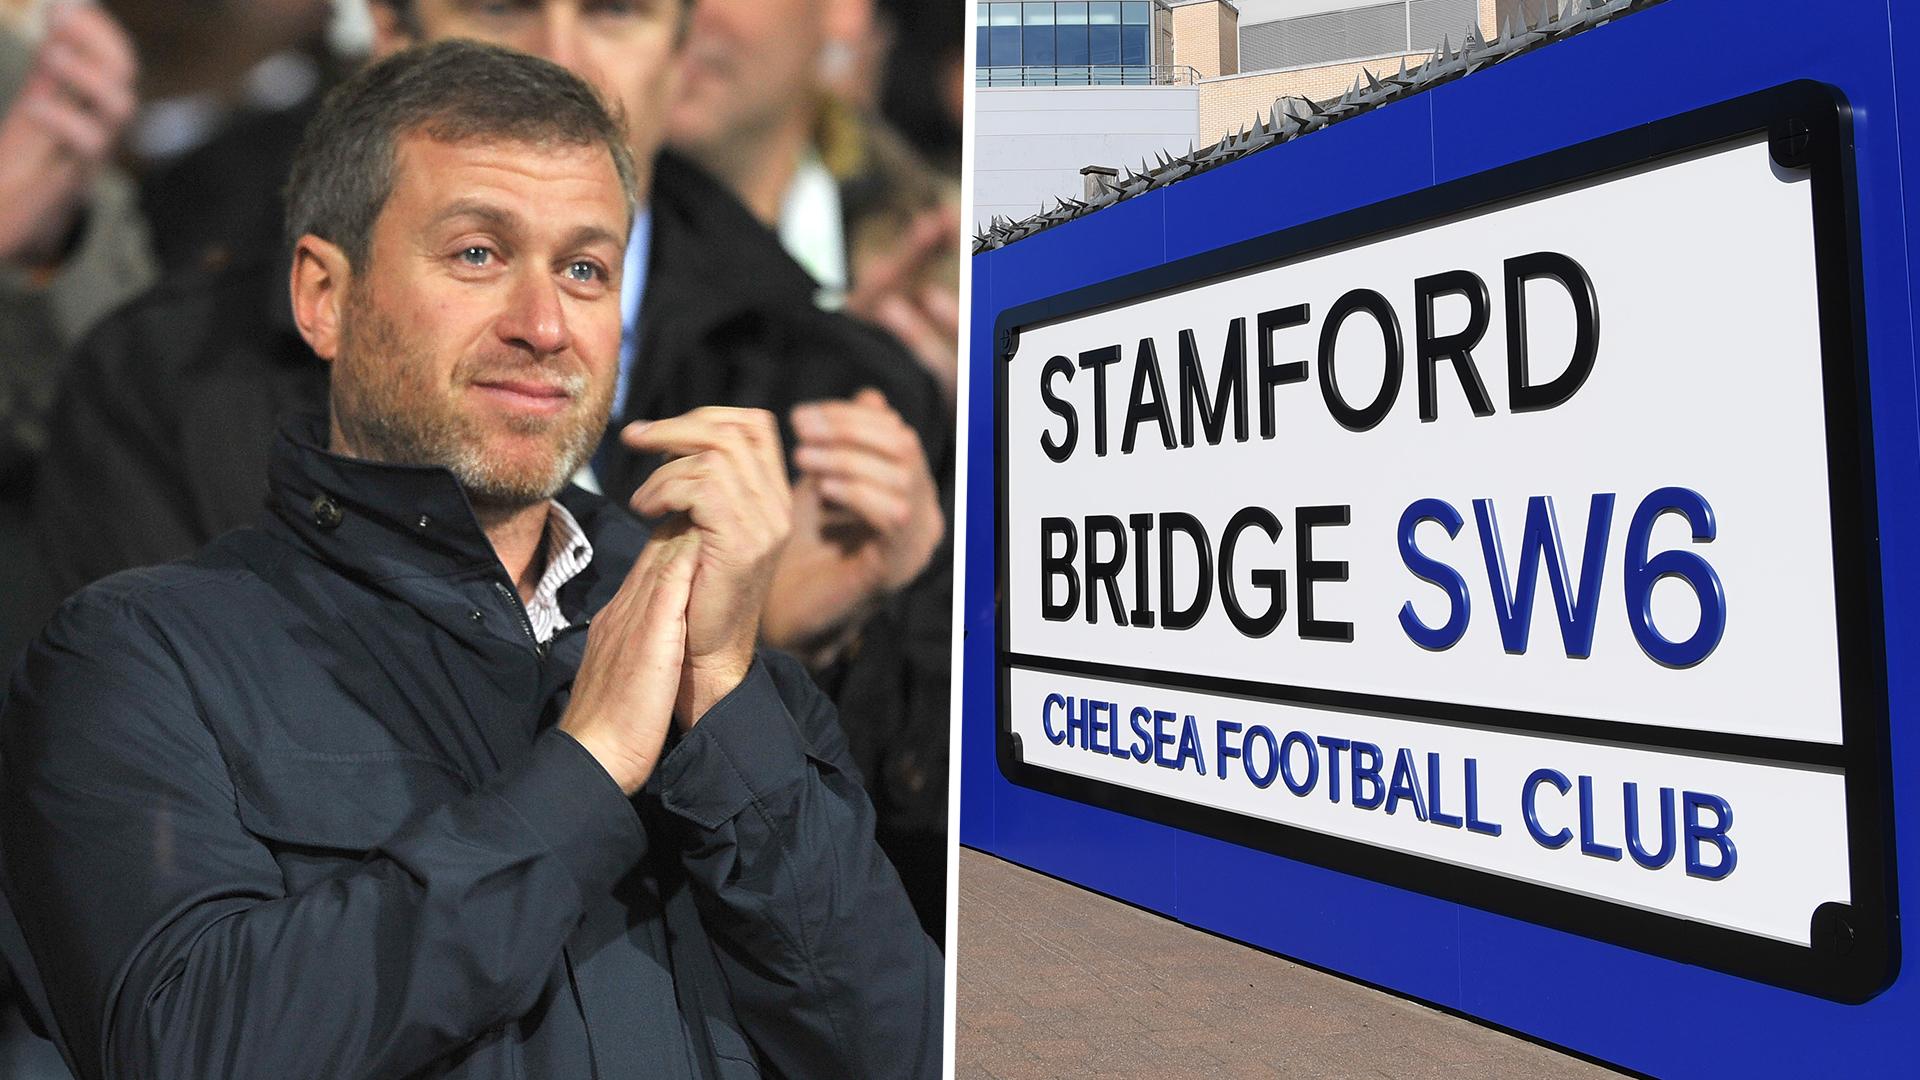 Roman Abramovic, Stamford Bridge split